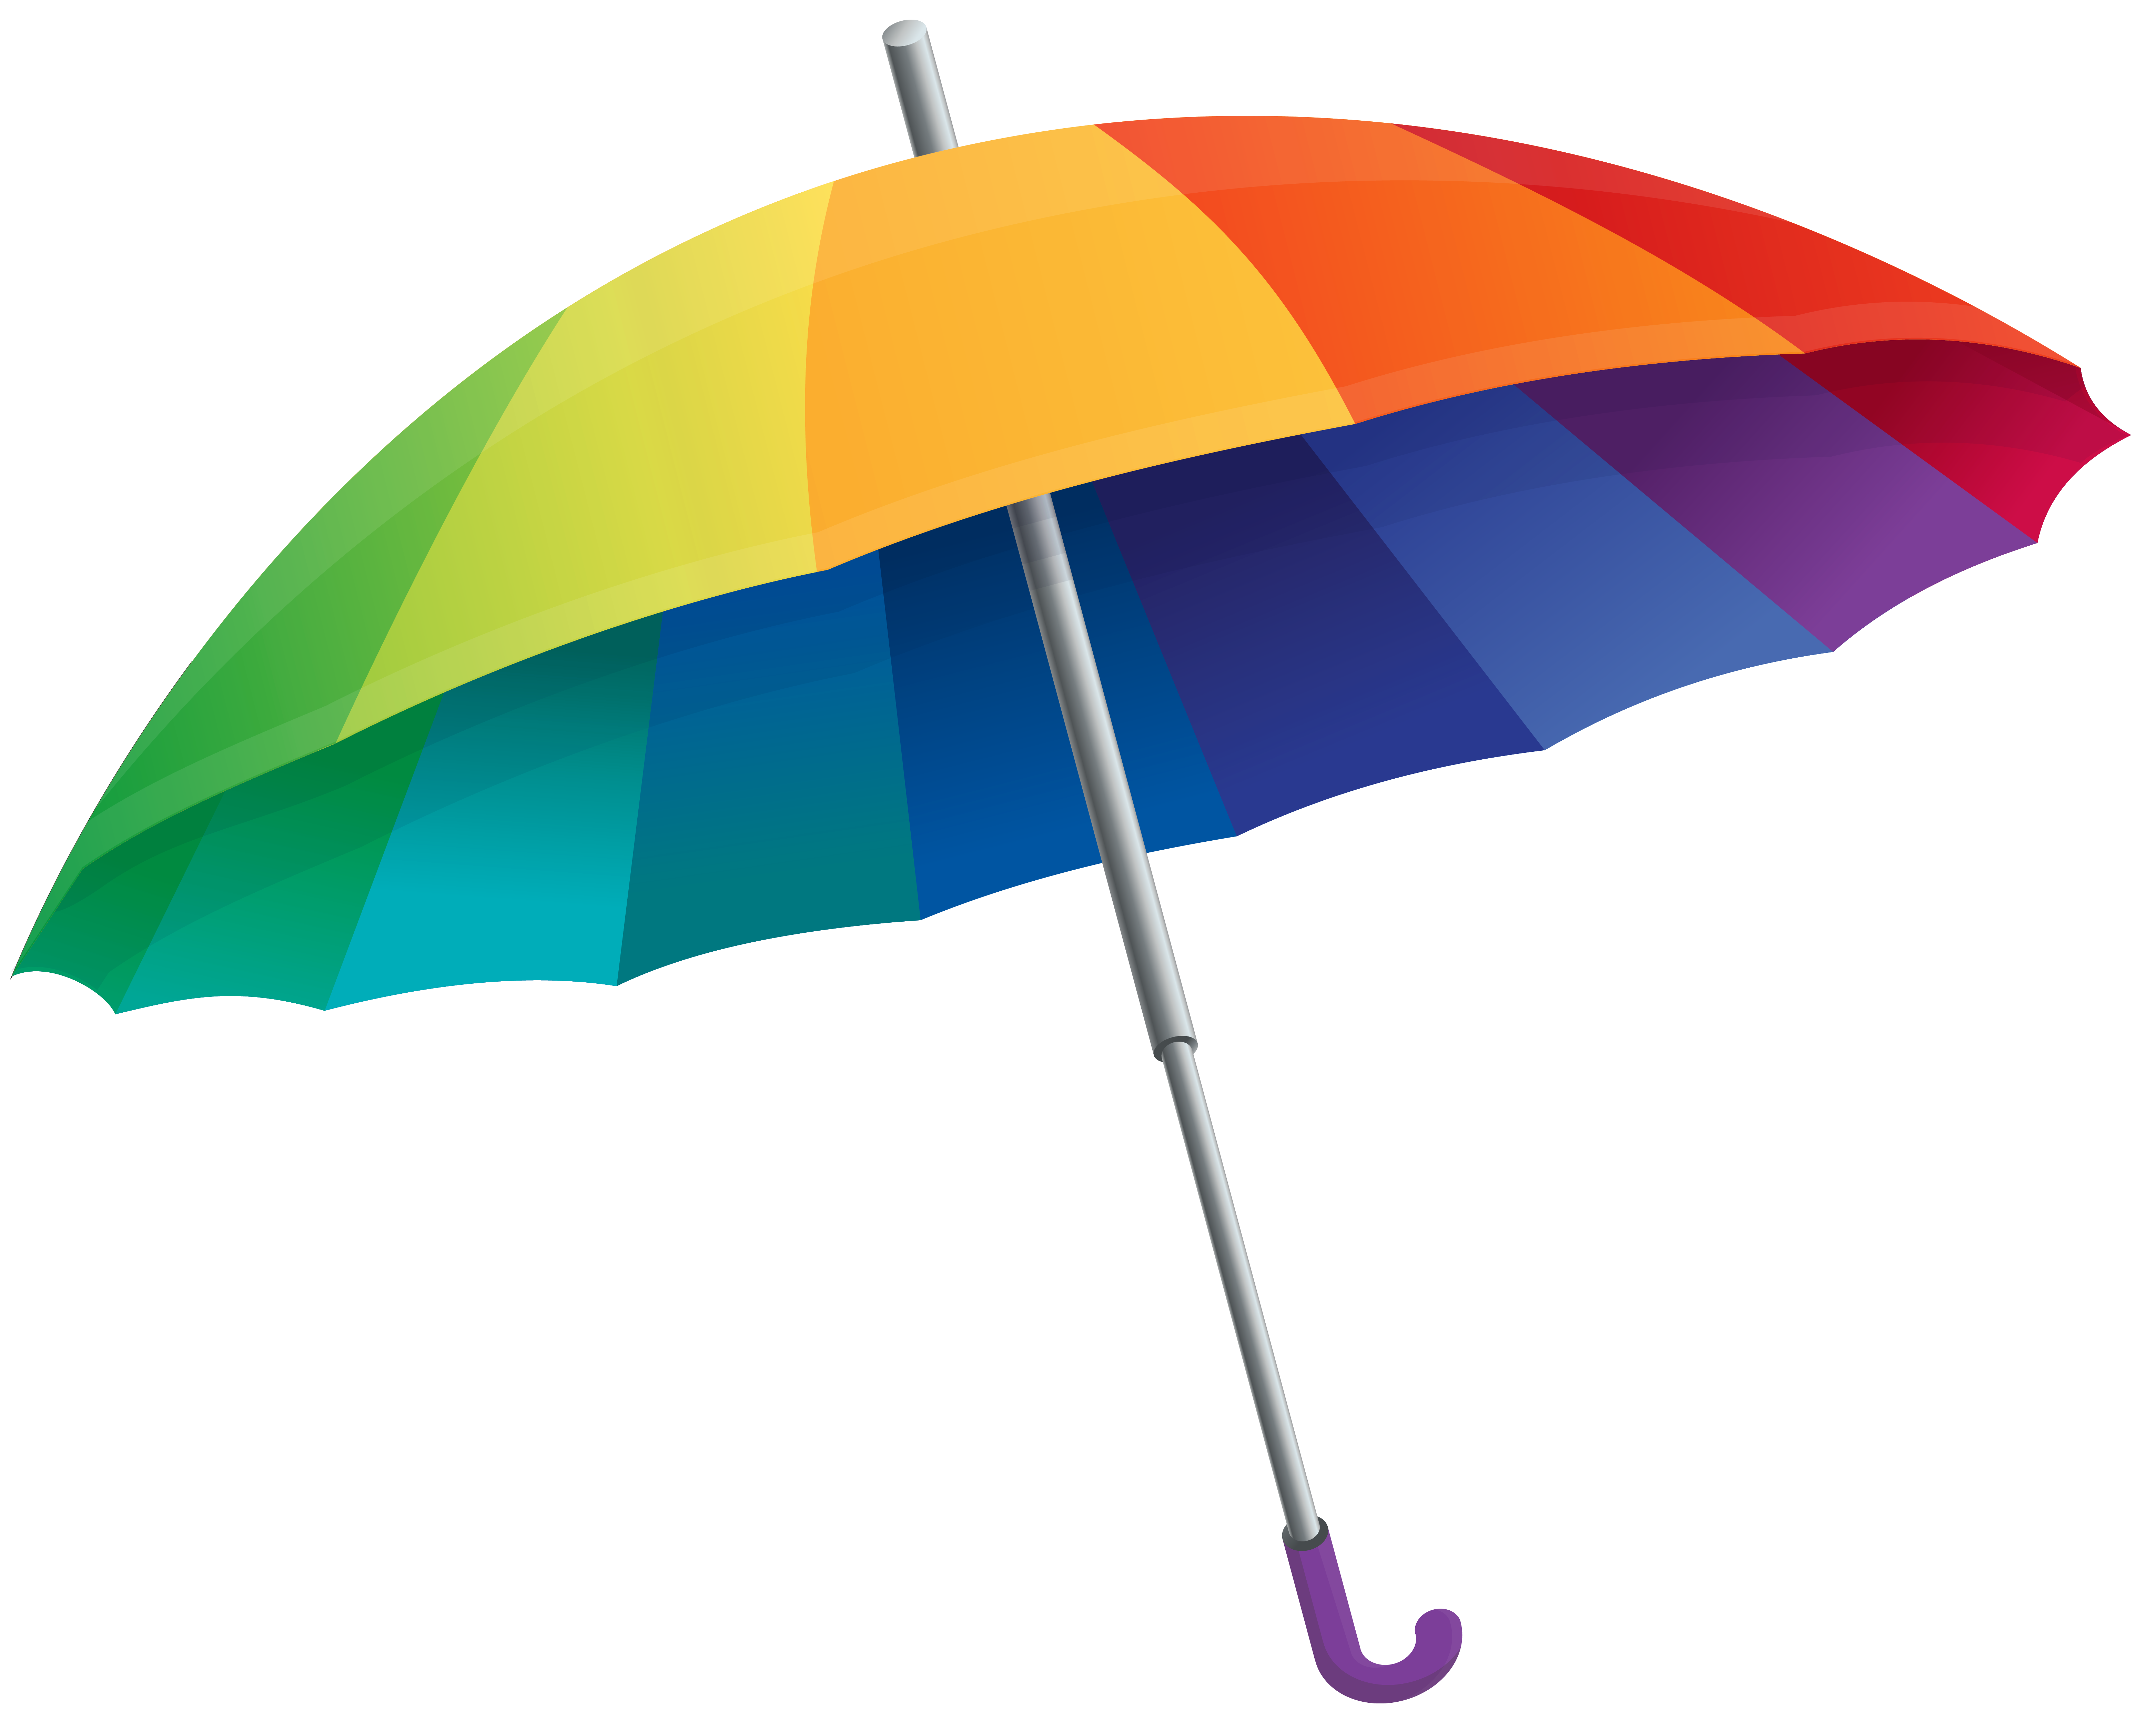 6255x4964 Umbrella Clipart Transparent Background